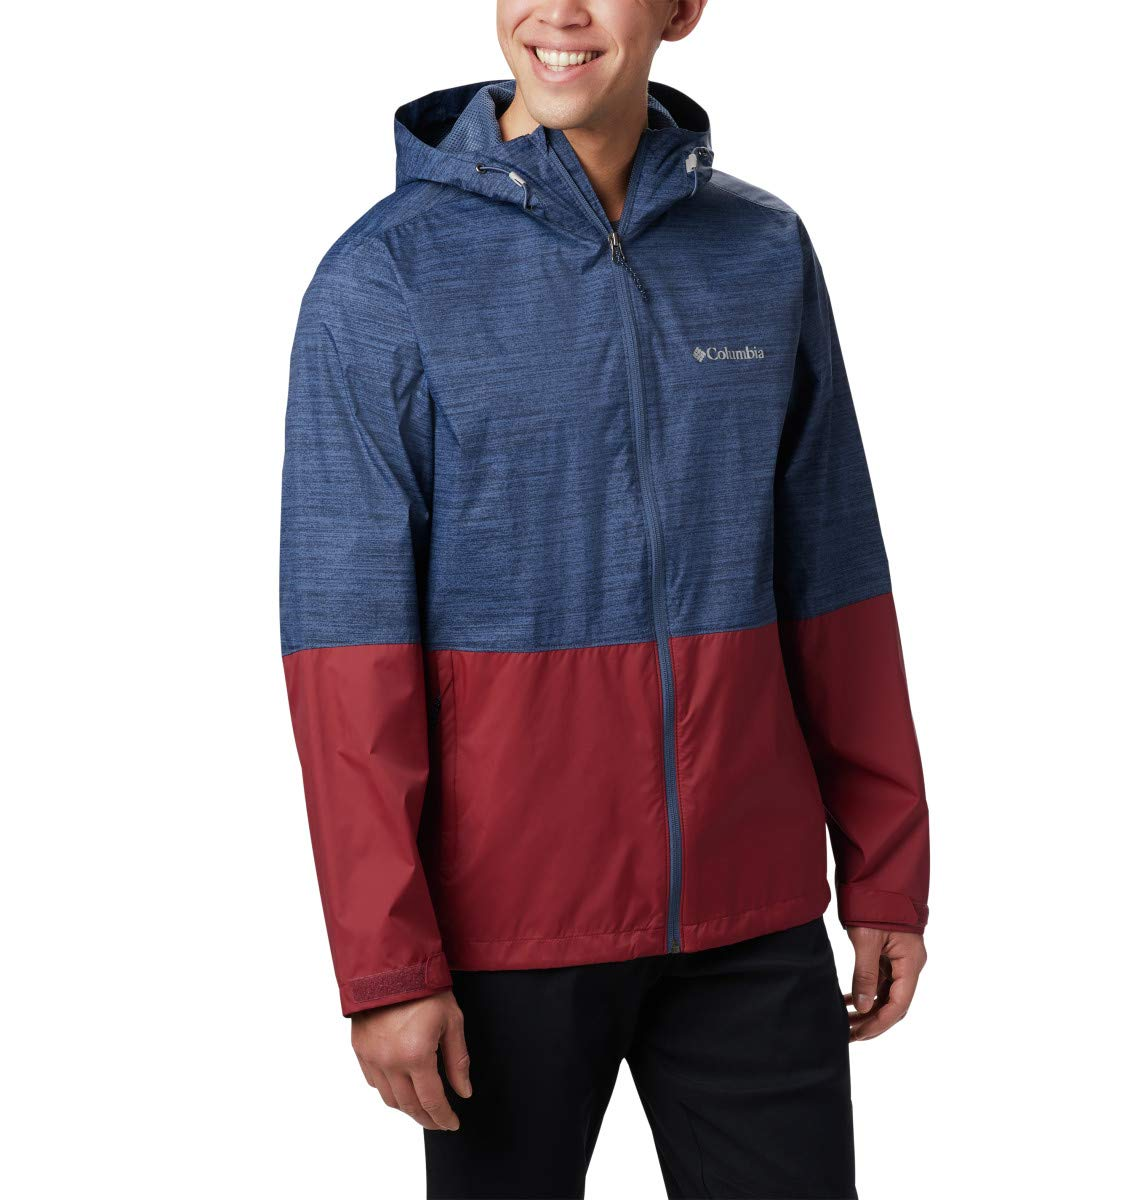 Columbia Men's Roan Jacket, Dark Mountain Texture Print, red Jasper, X-Large by Columbia